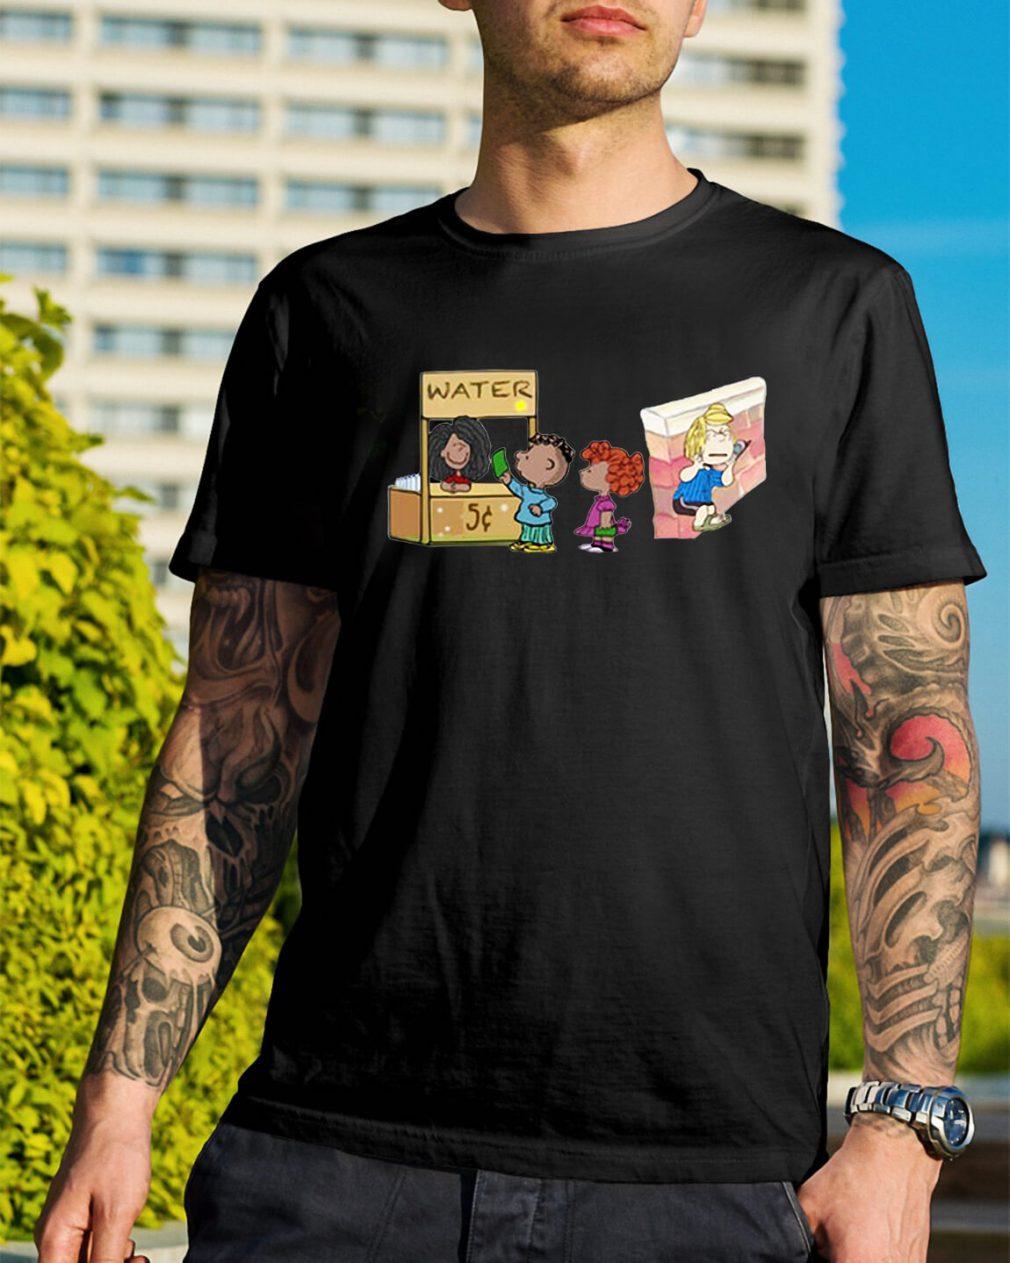 The peanuts permit patty shirt